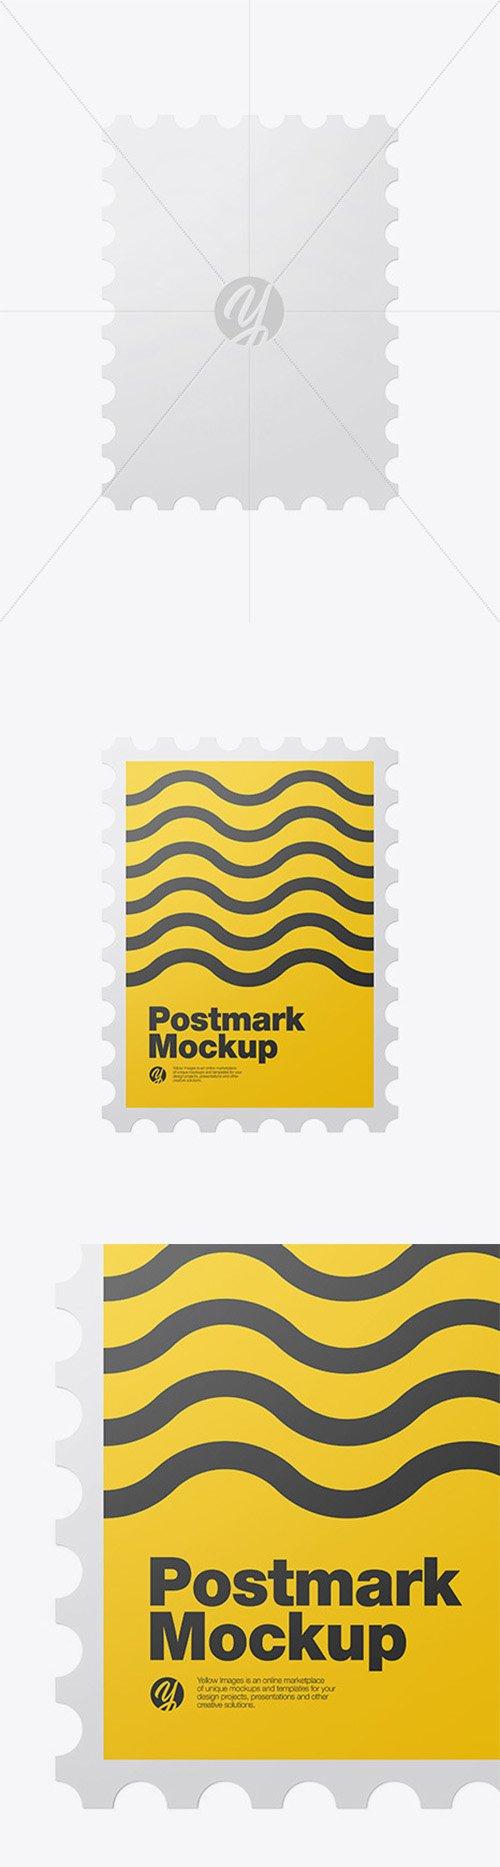 Postmark Mockup 47365 TIF